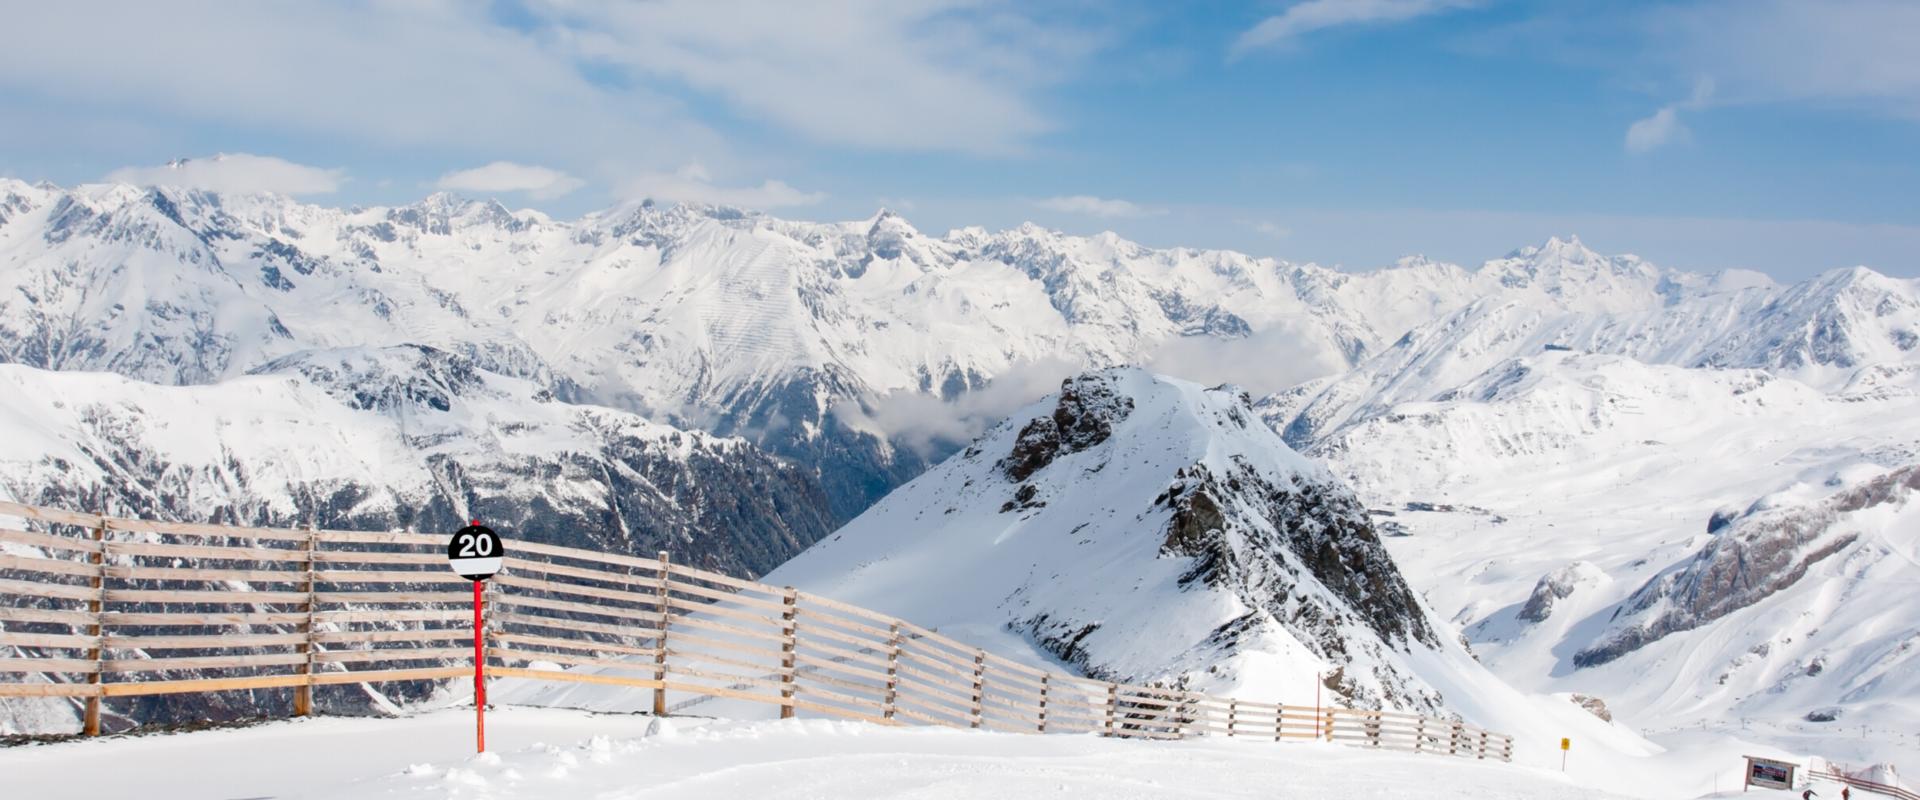 Skireizen en shortski in Oostenrijk en Duitsland